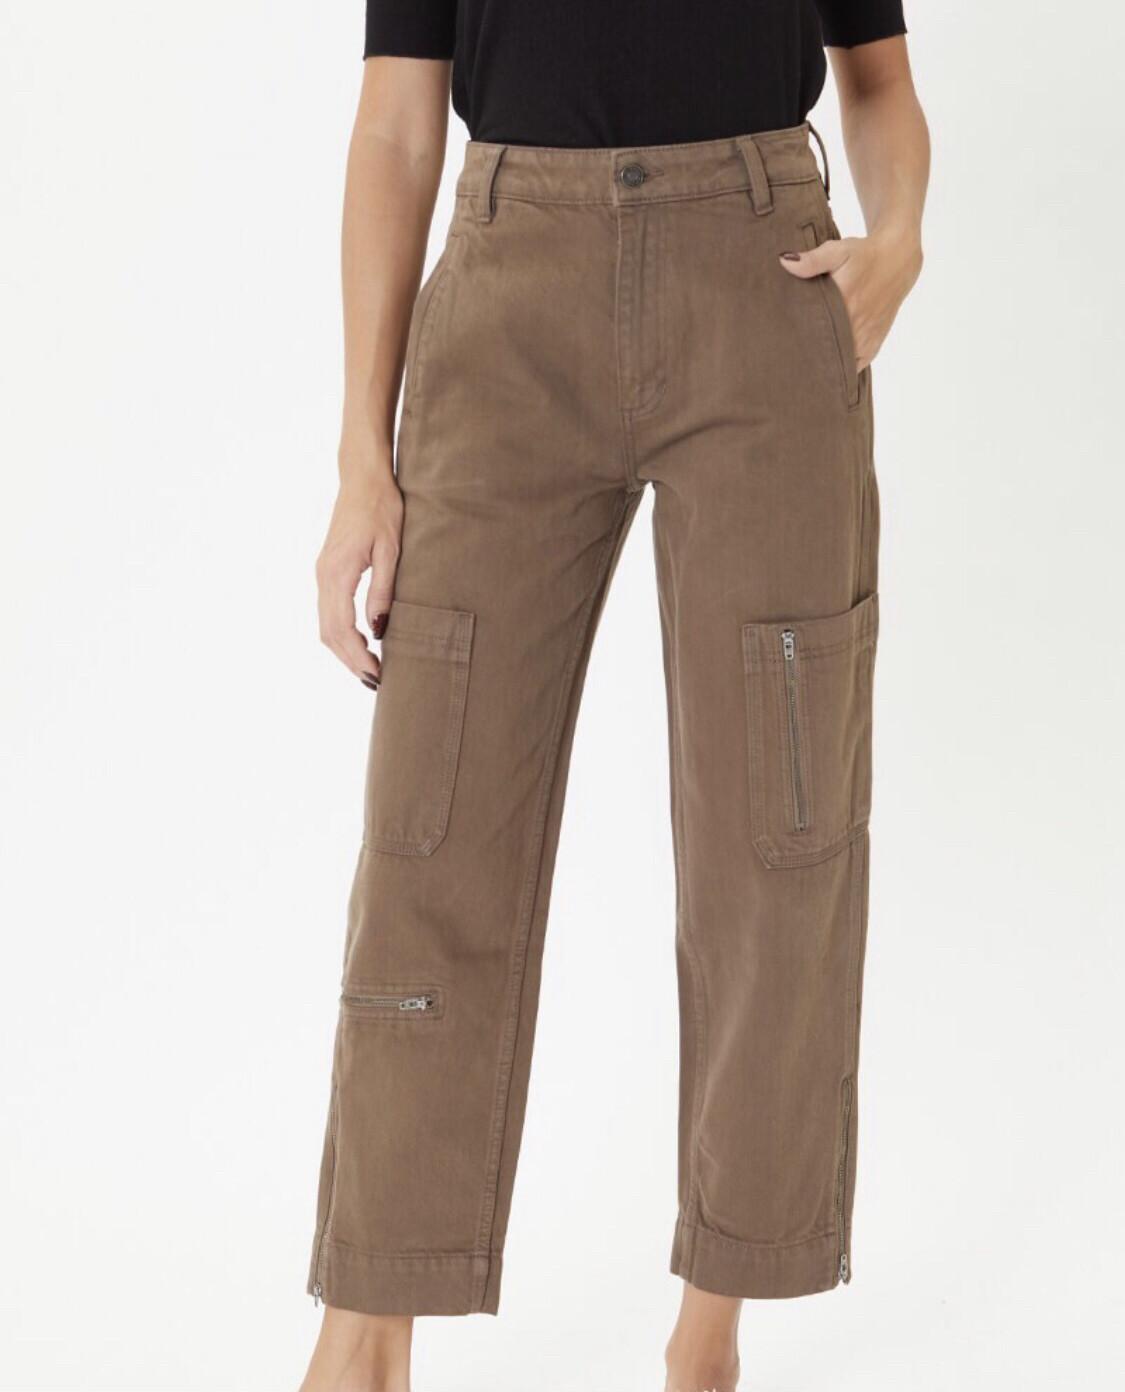 HR Cargo Pants